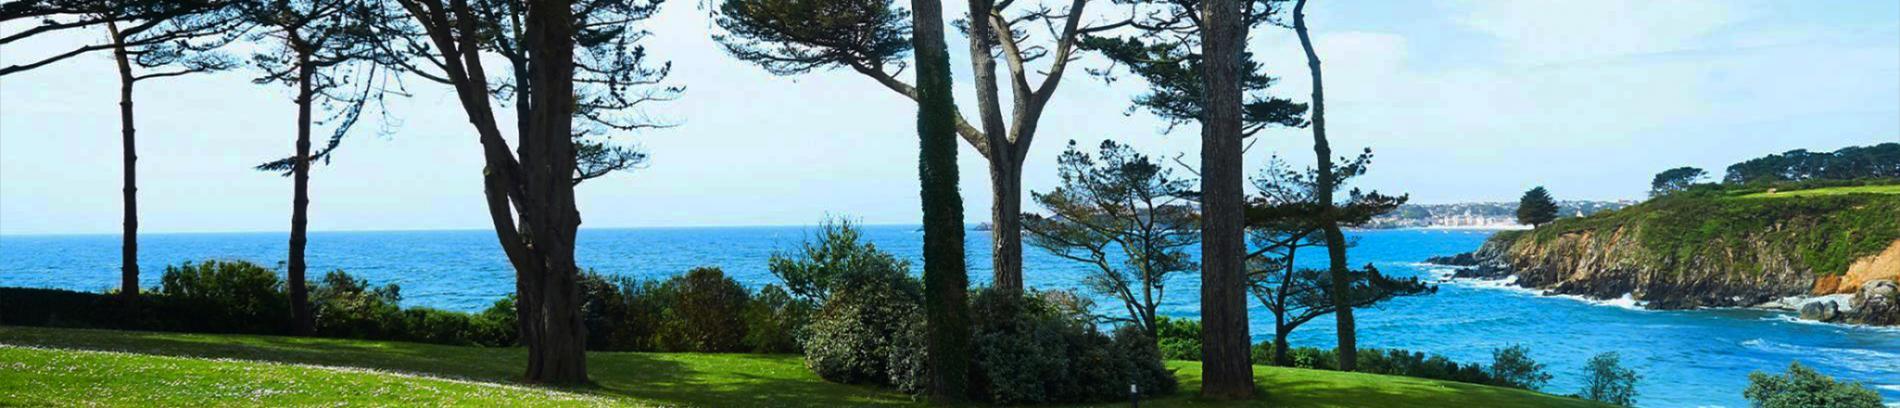 Slide vue mer depuis la résidence